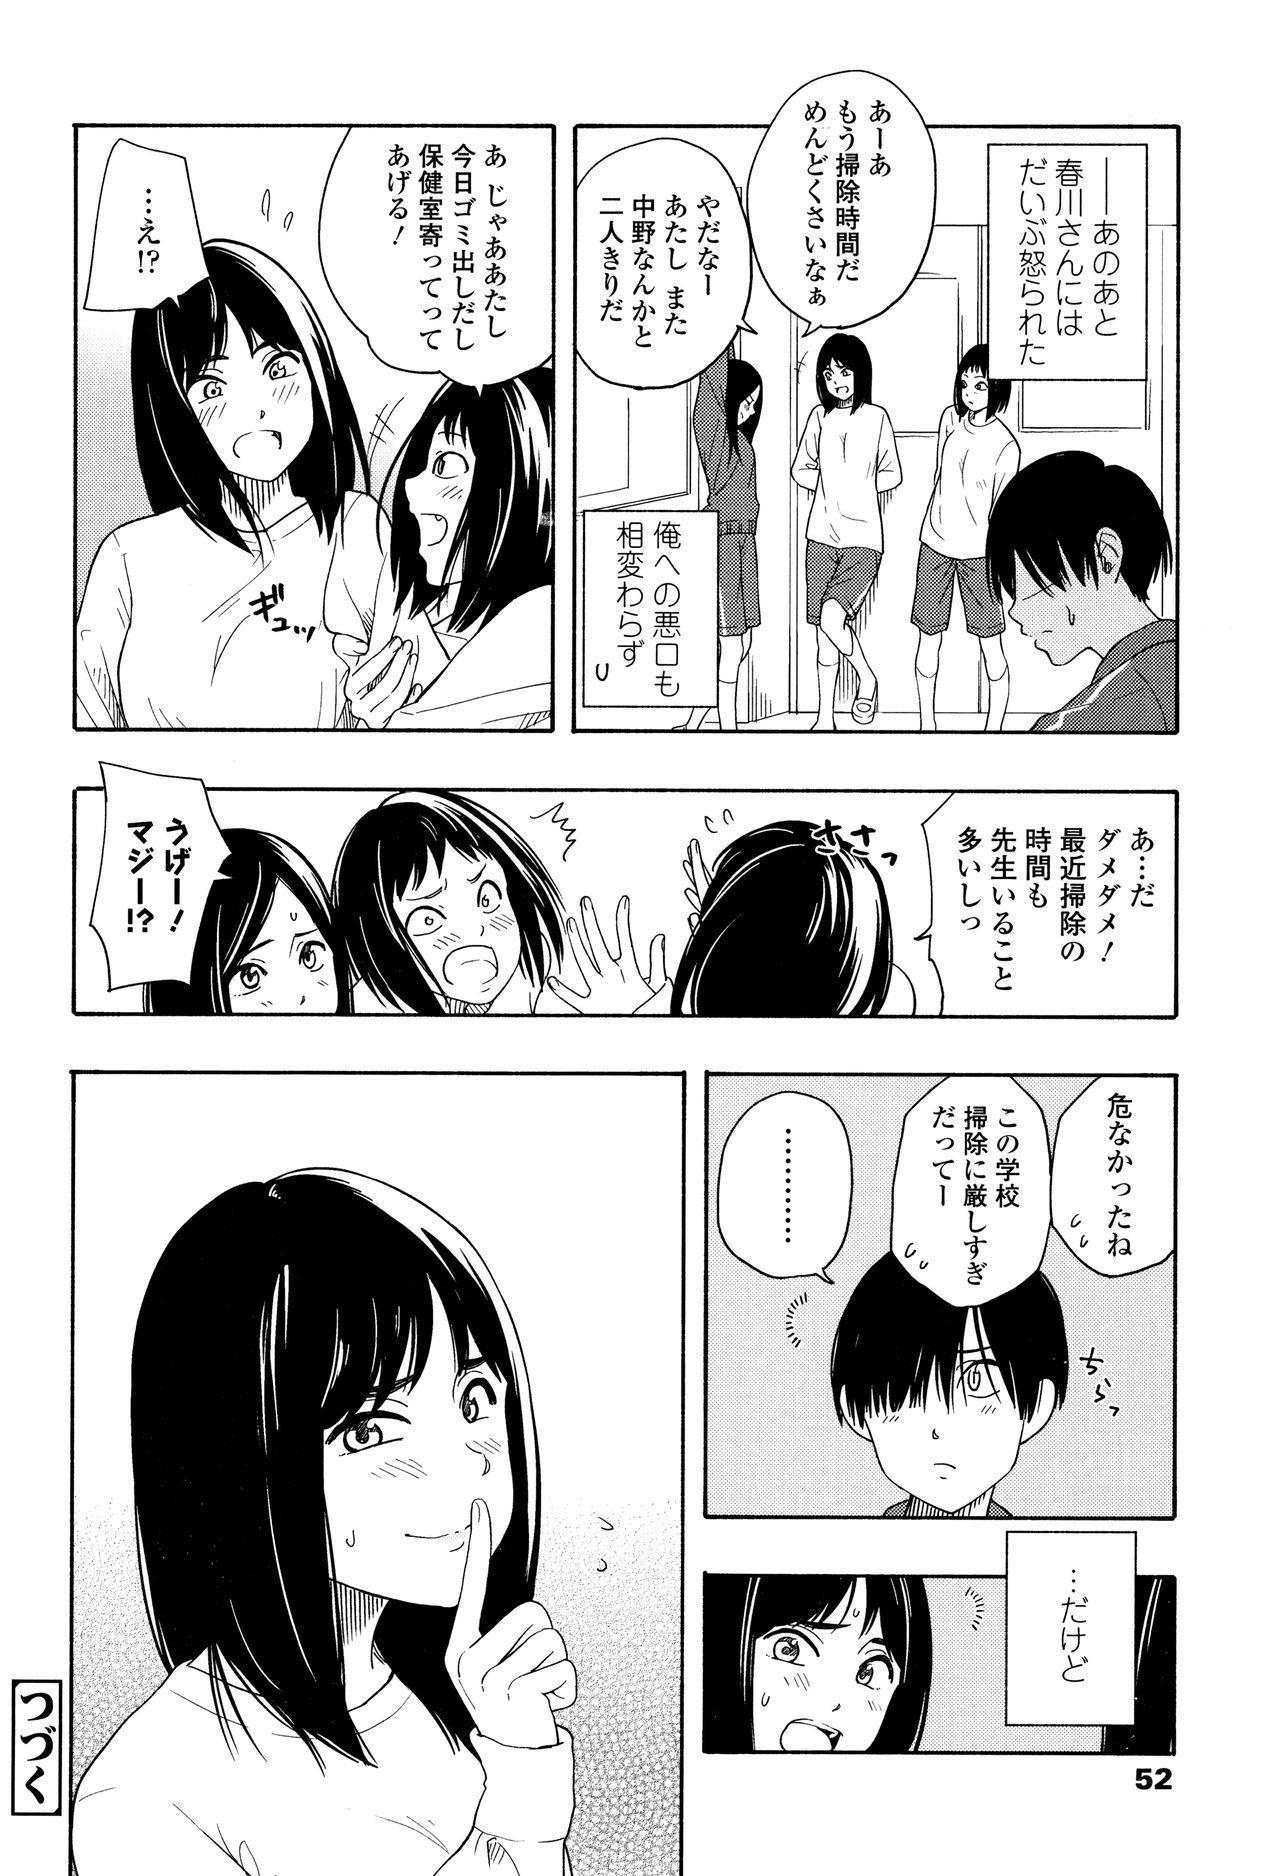 Shishunki no Eros - puberty eros 54